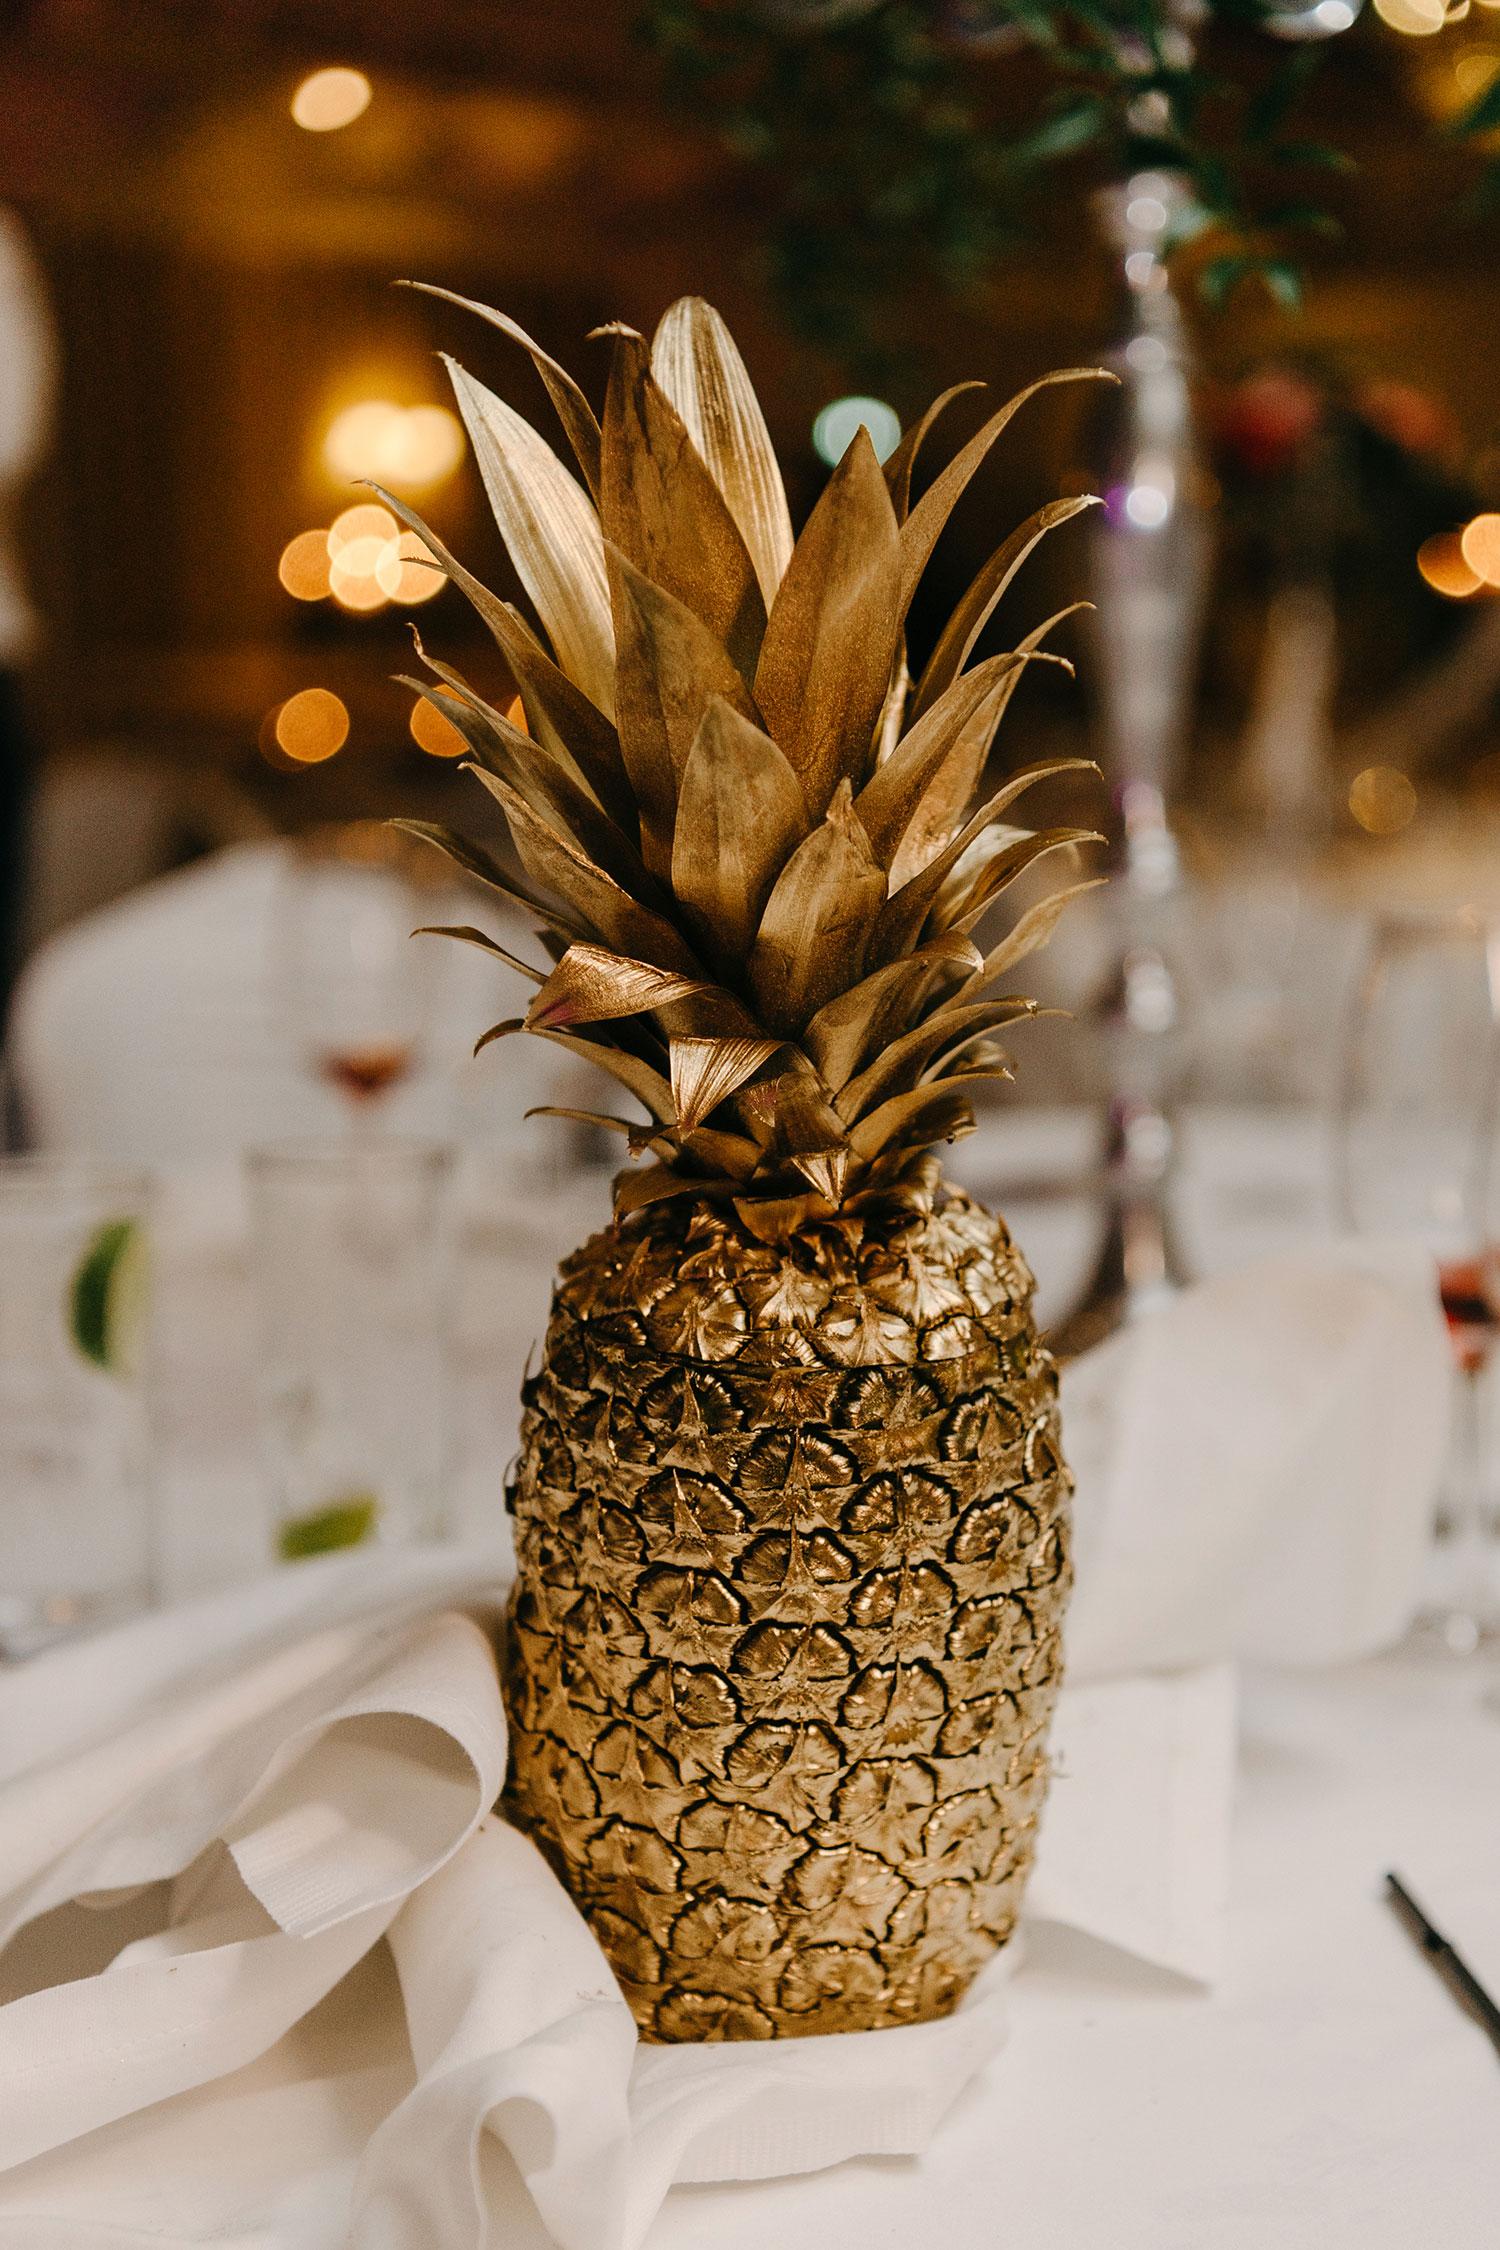 powerscourt-hotel-wedding-photographer-0166_0916.jpg